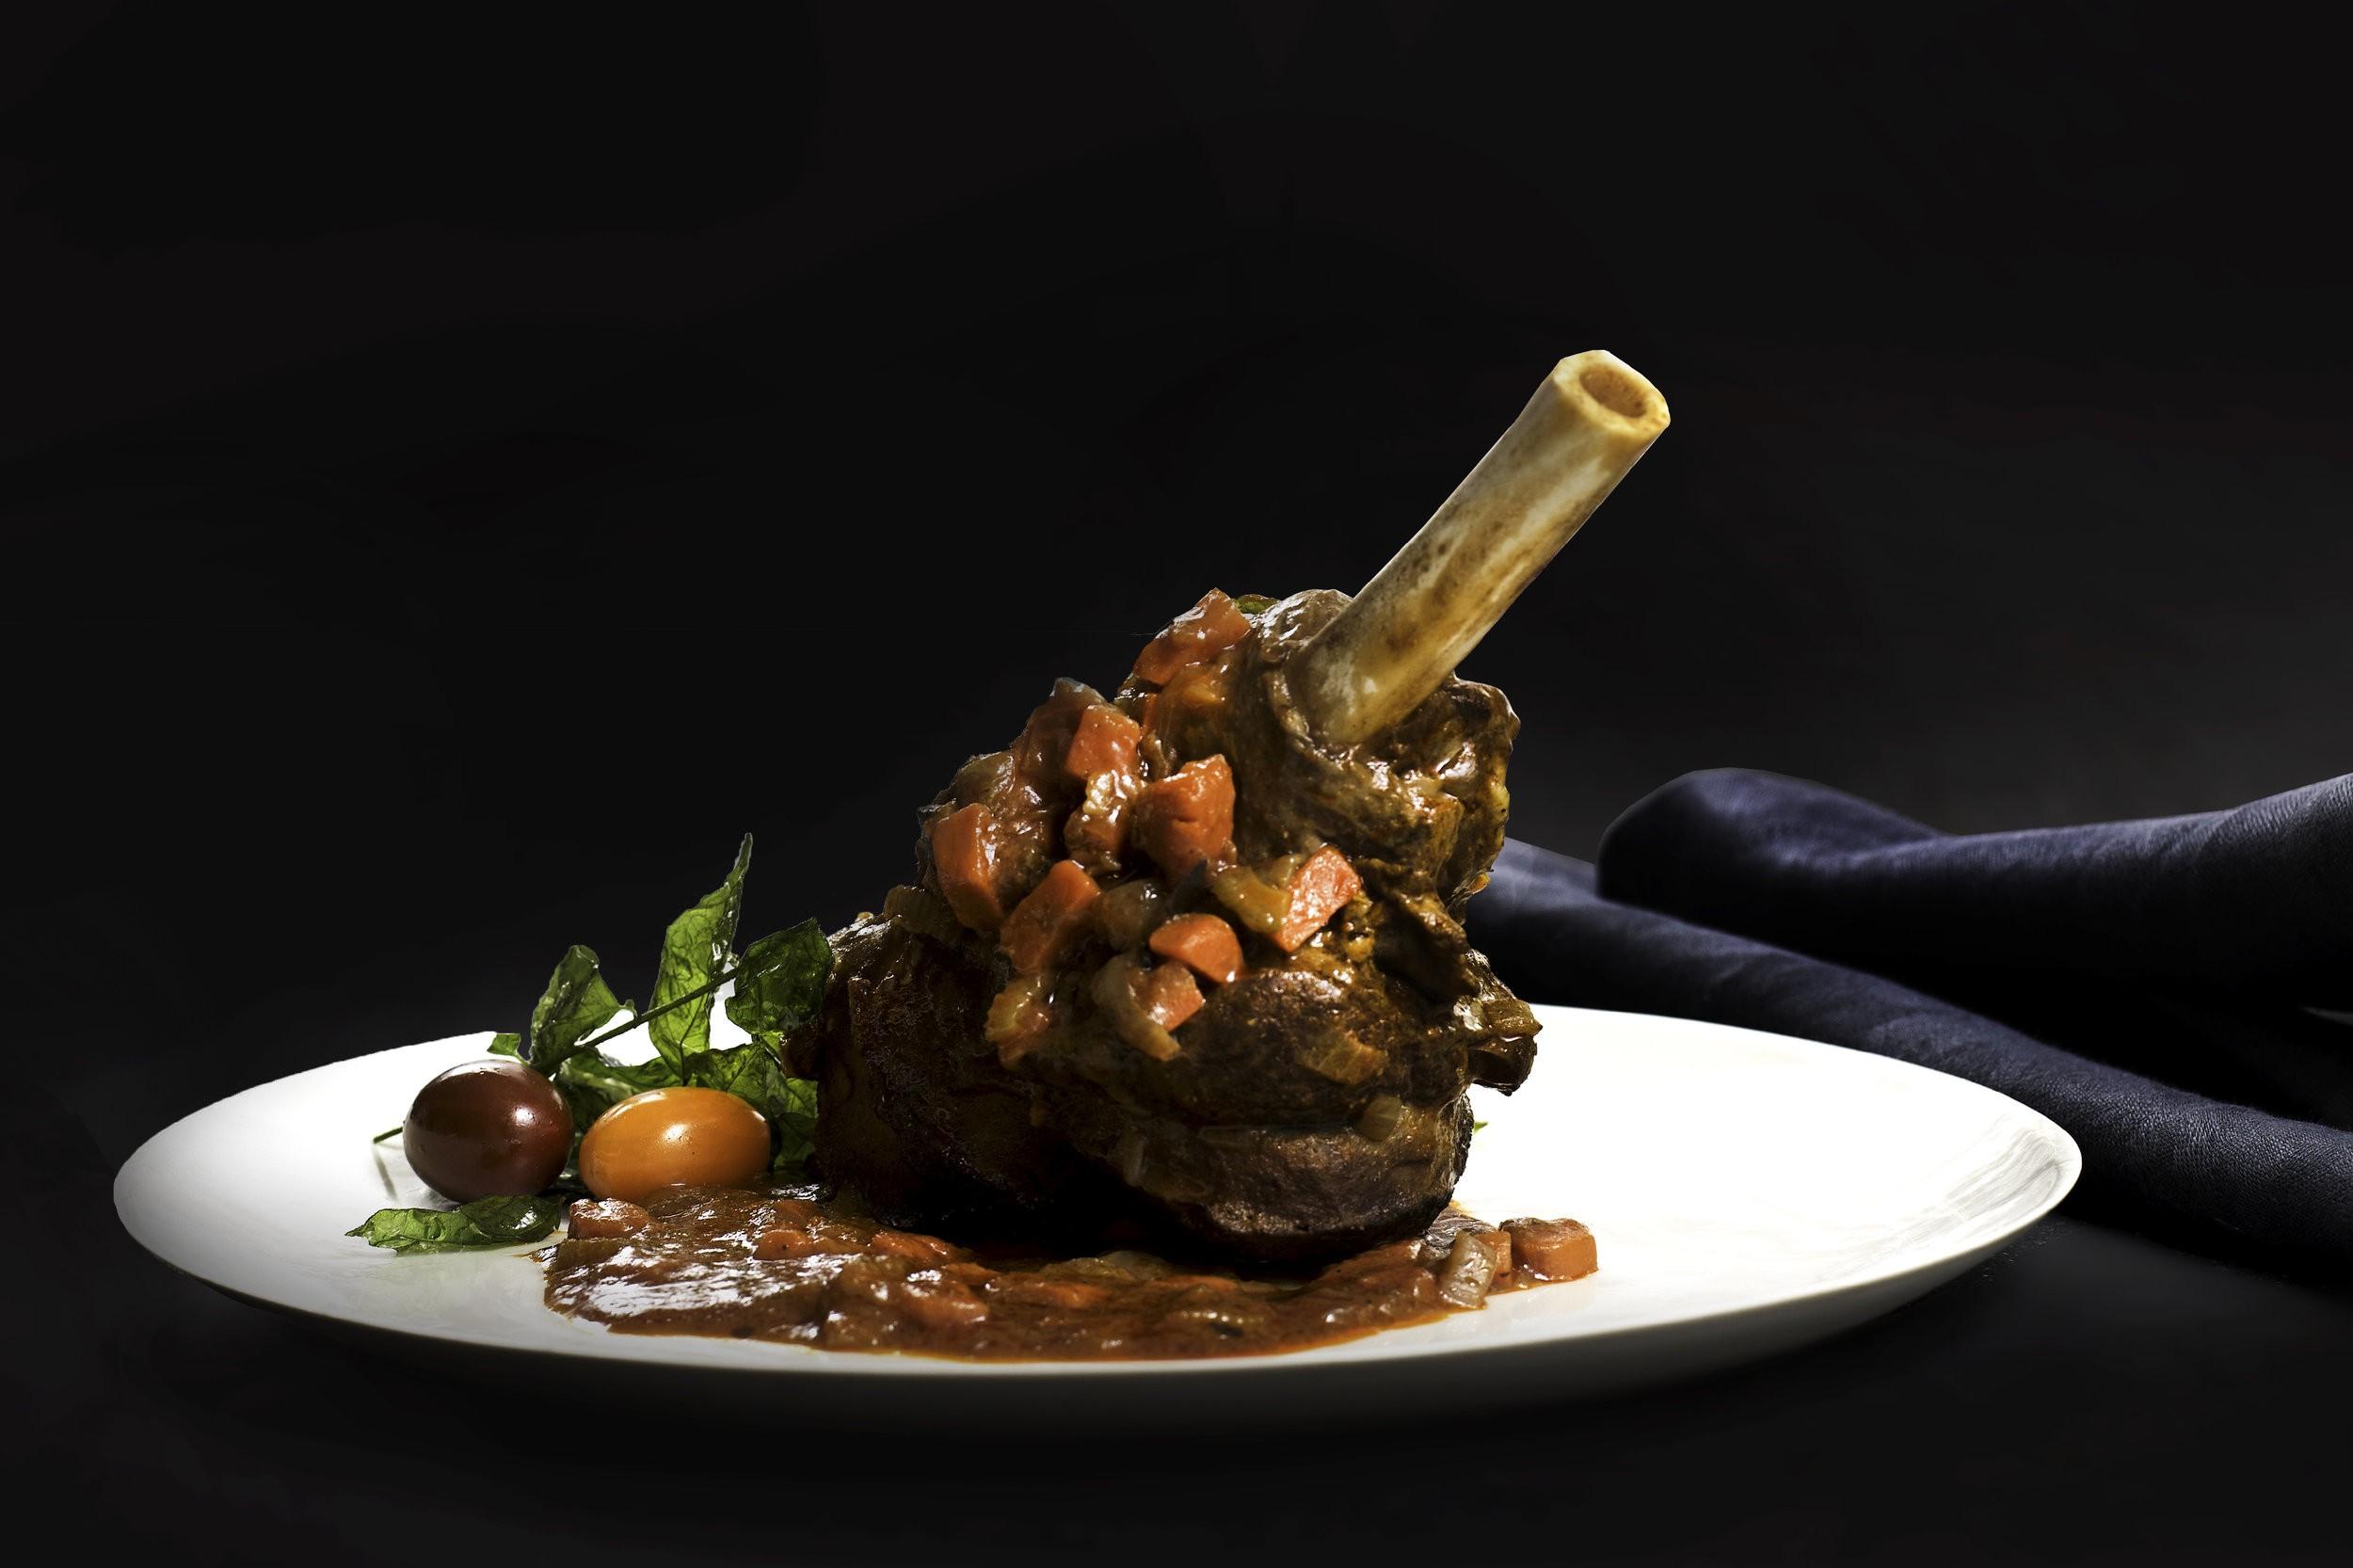 10 Of The Best Restaurants In Dutchess County Restaurants Hudson Valley Chronogram Magazine